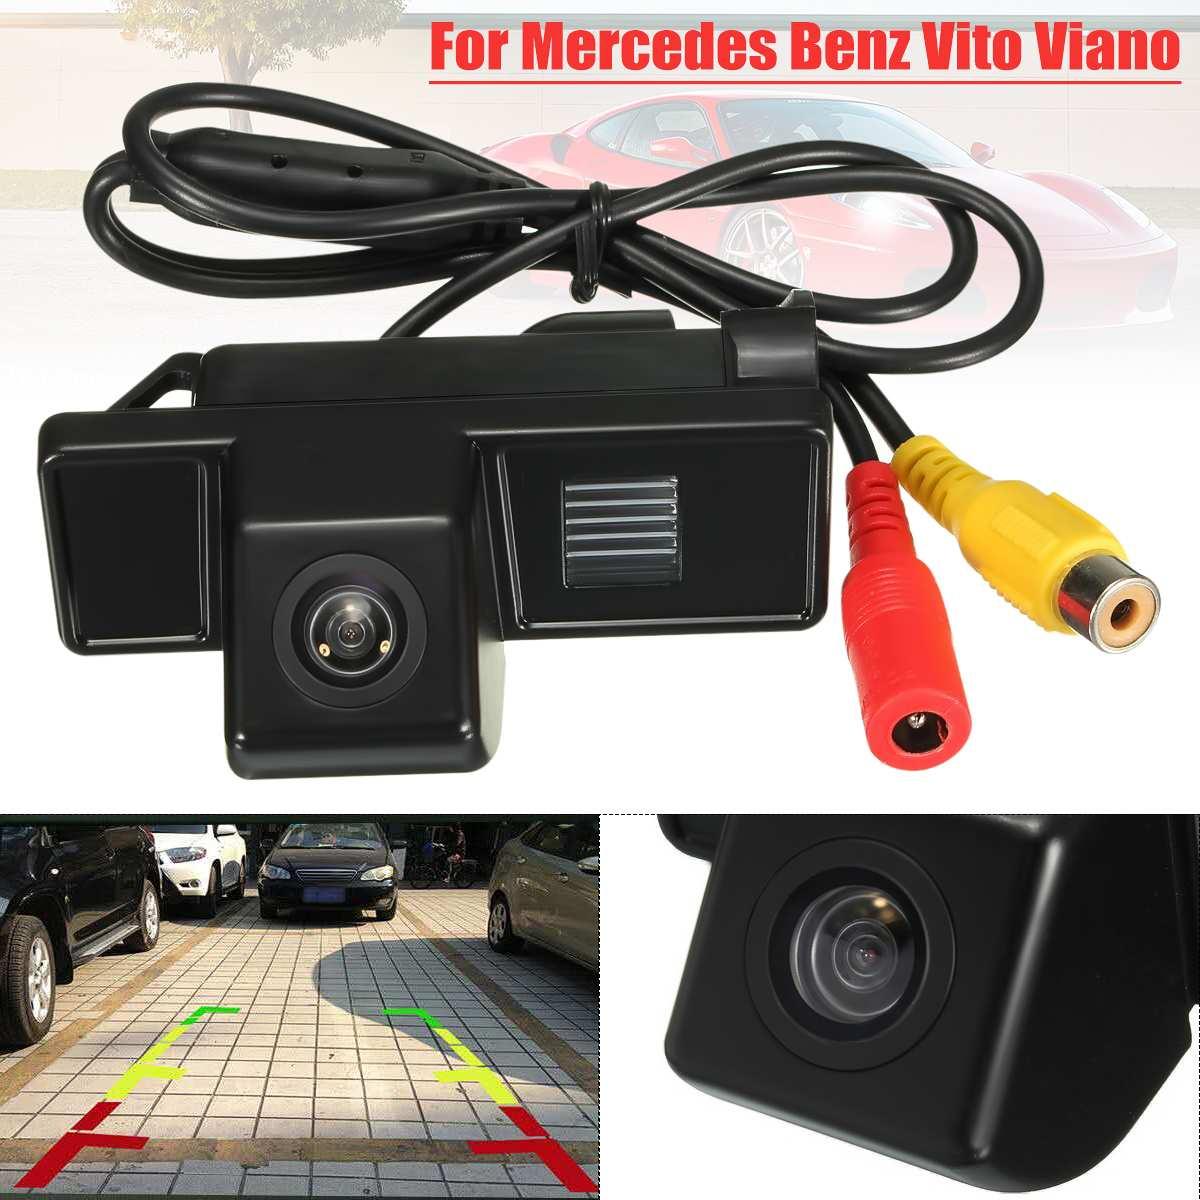 170 Degree CCD Reverse Reversing Camera For Mercedes for Benz Vito Viano 2004 Car Rear View Camera Back up Reversing Camera